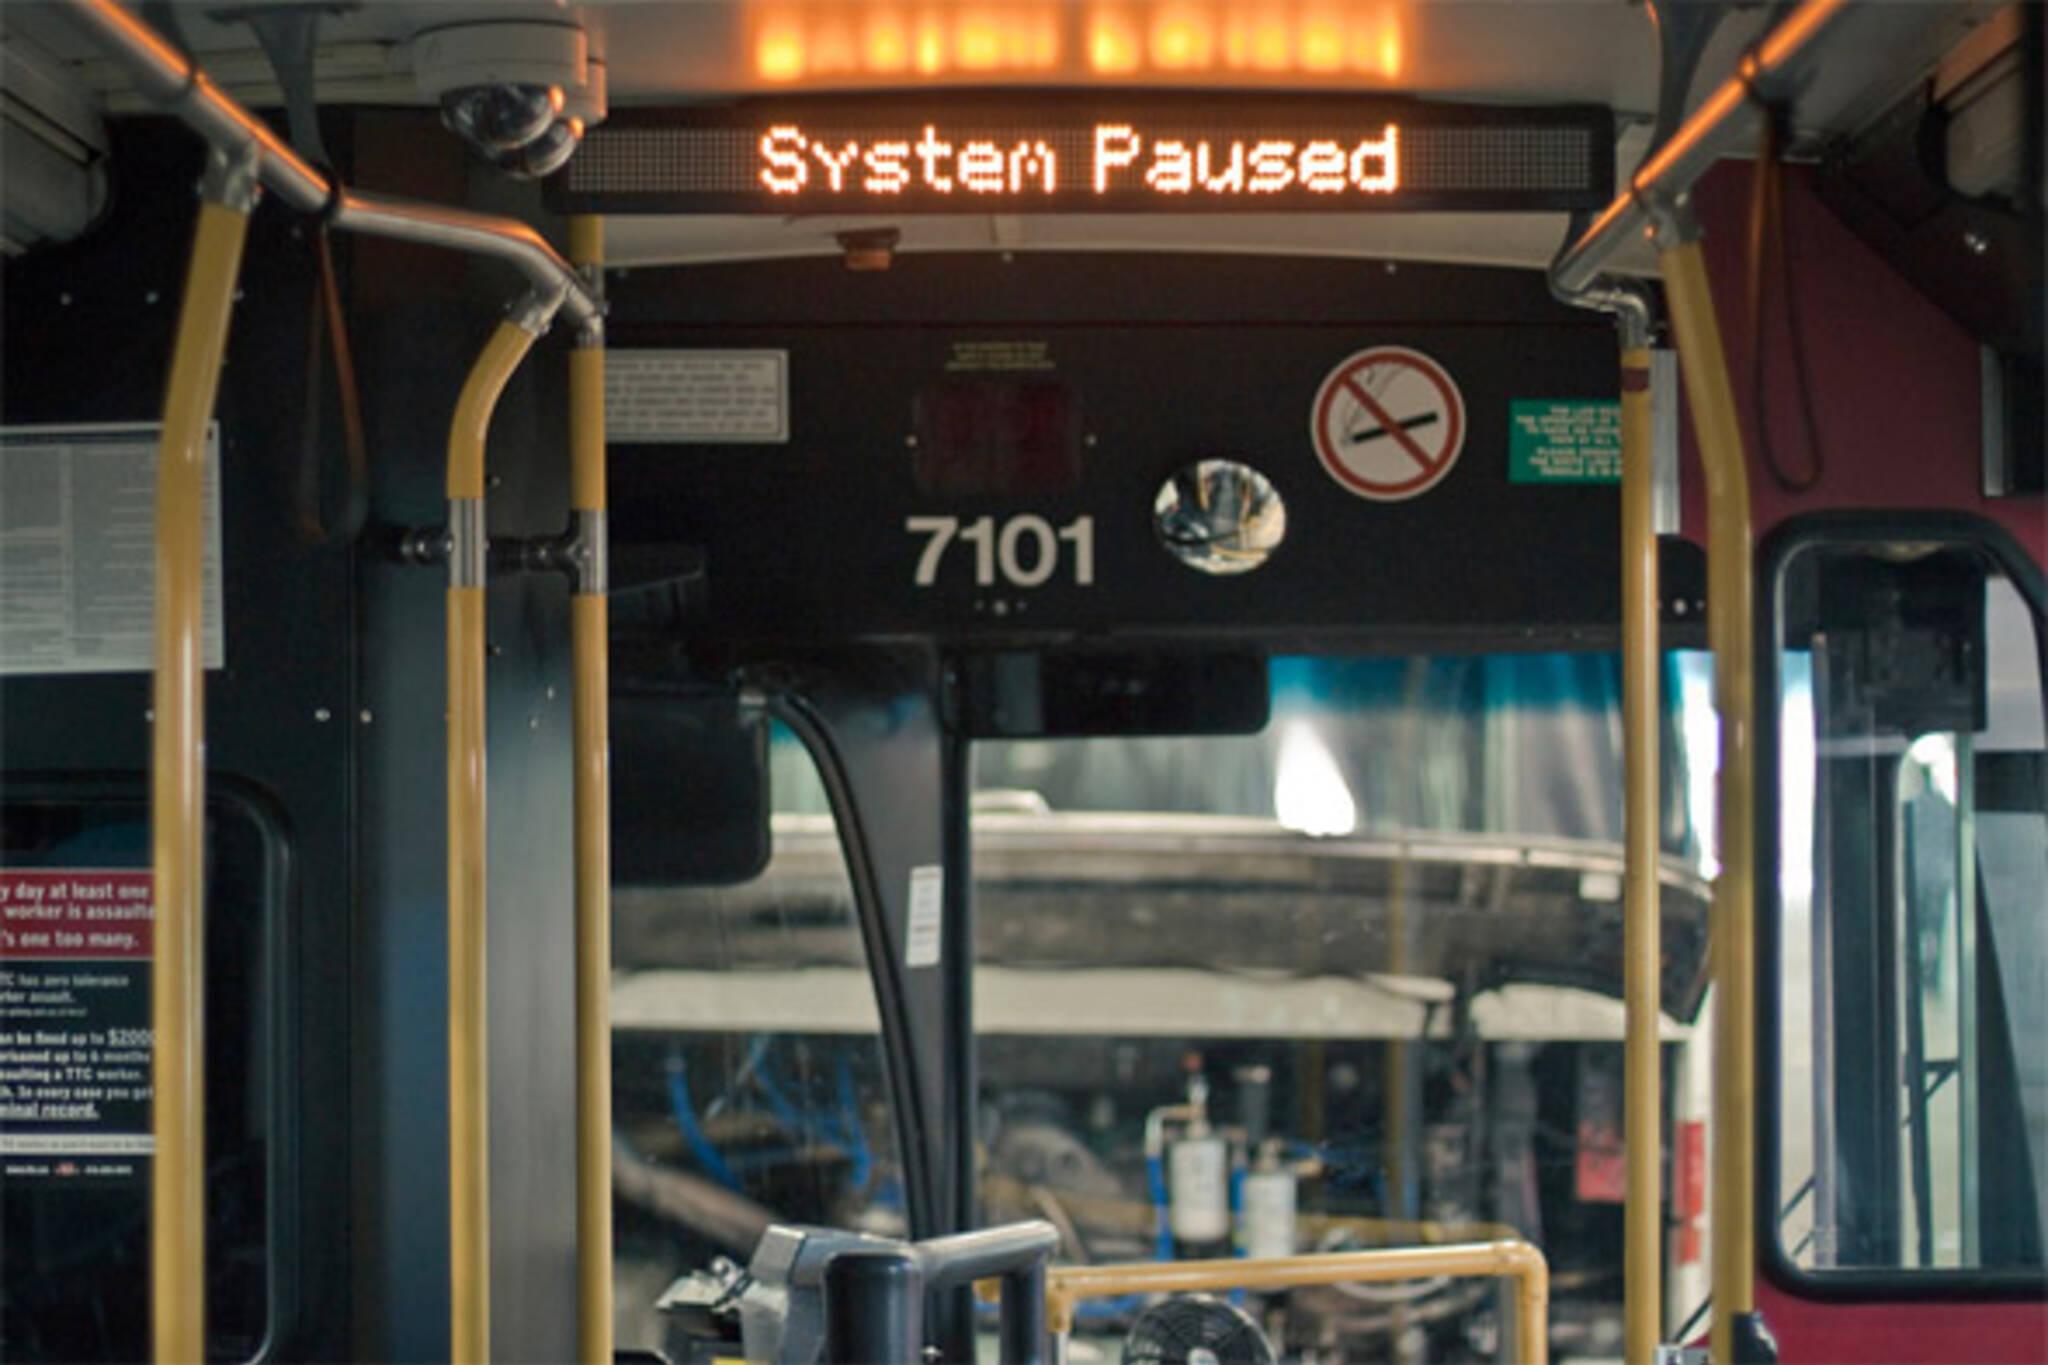 ttc idling buses